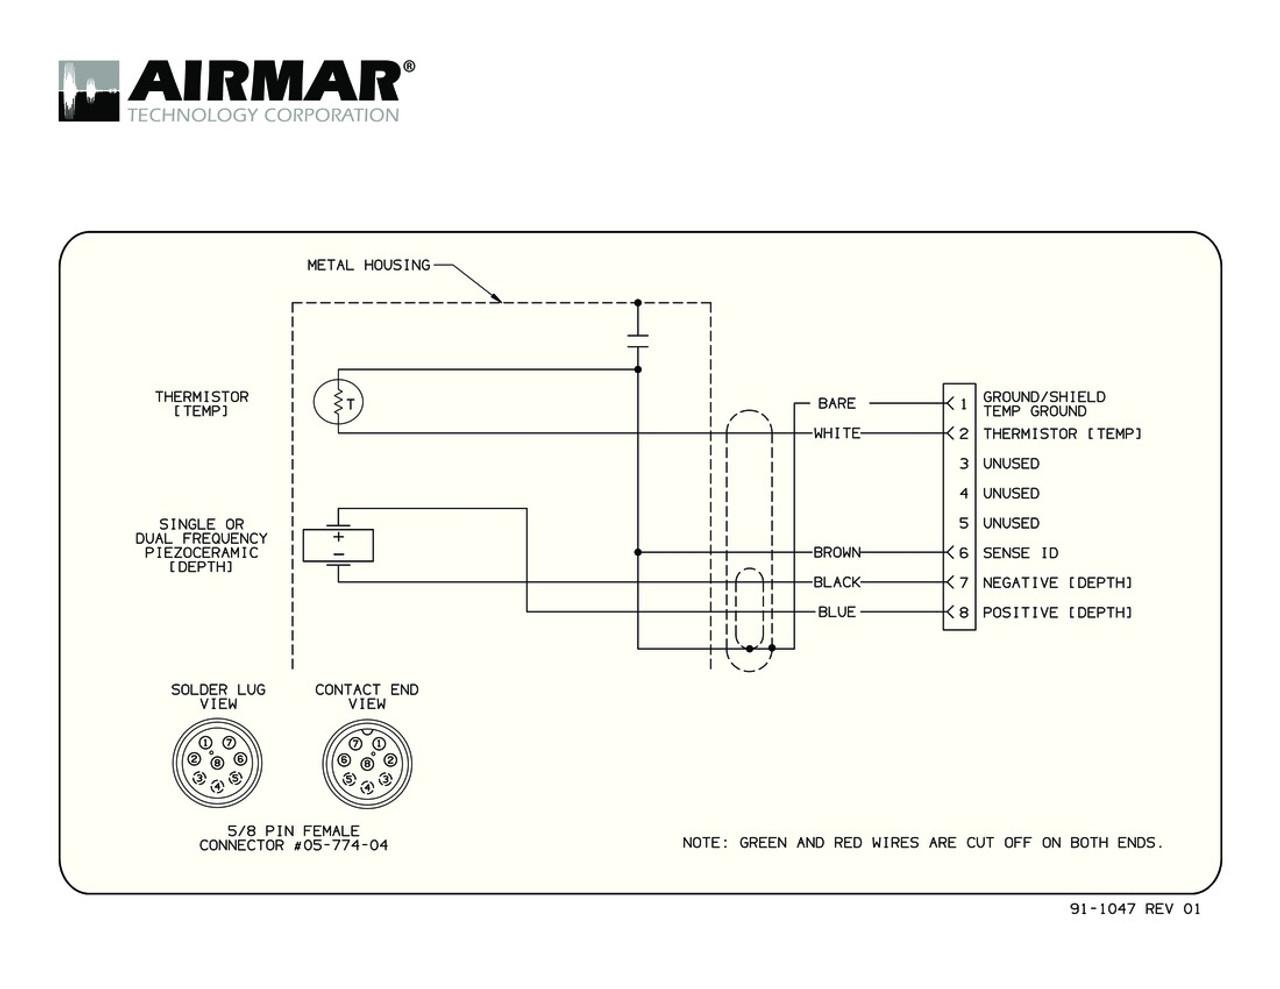 Garmin Marine Wiring Diagram - Wiring Diagrams on